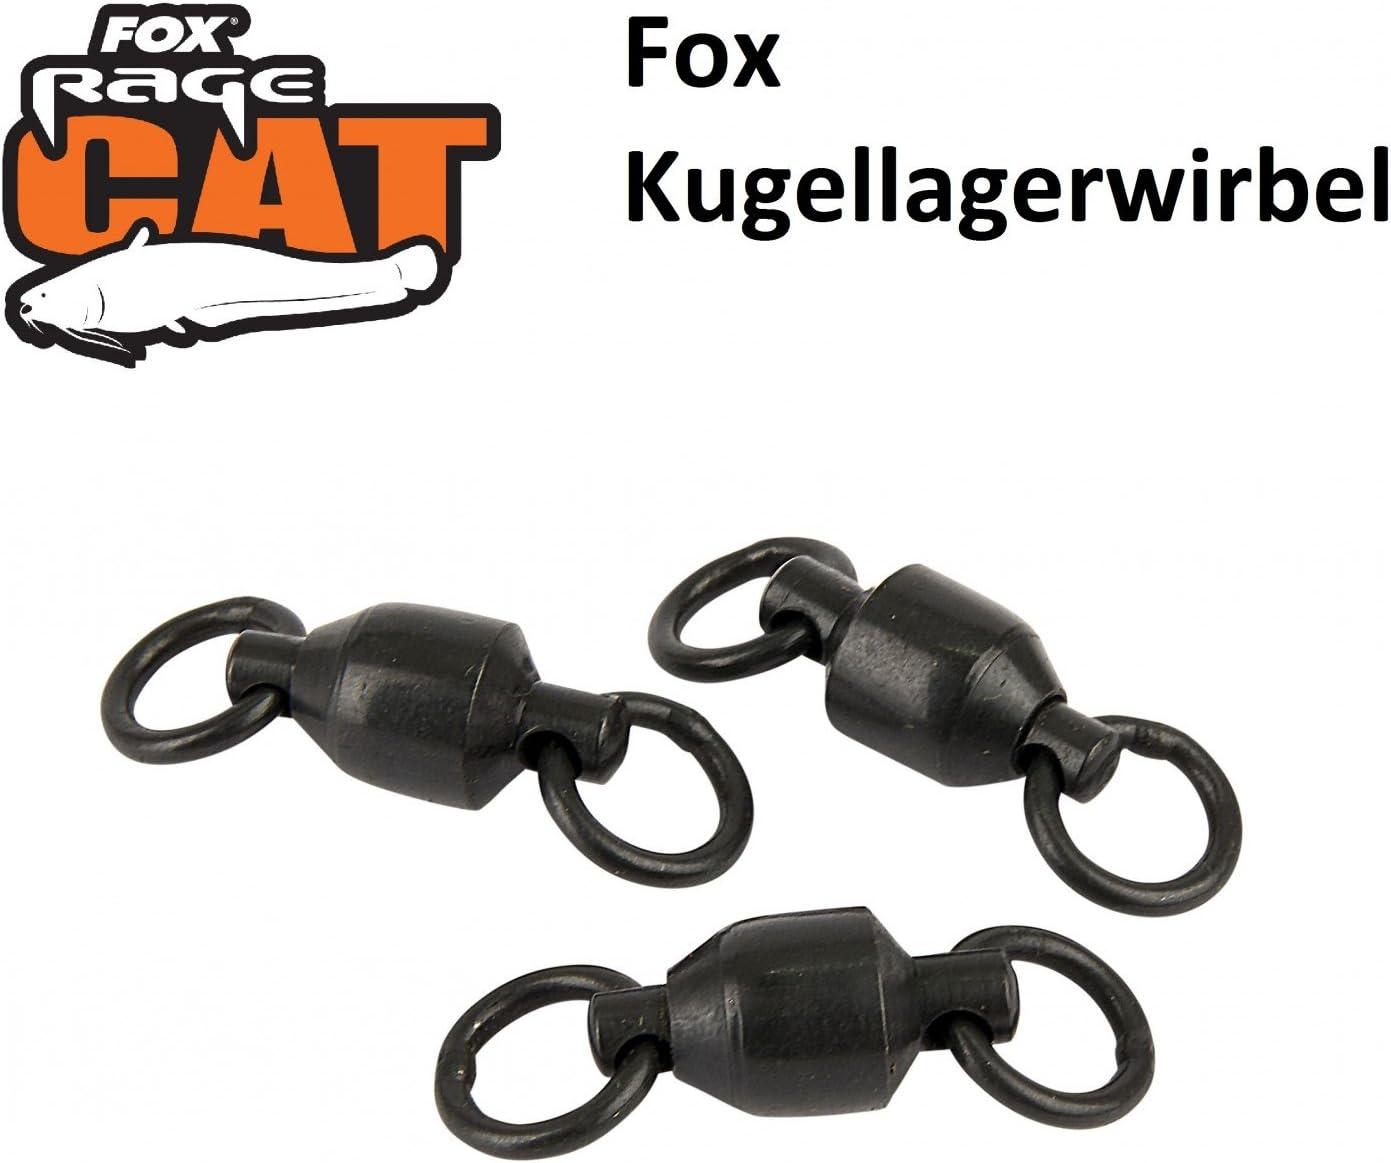 3 St/ück Wallerangeln Wirbel mit Kugellager Kugellagerwirbel Welswirbel Wirbel Fox Rage Cat Ball Bearing Swivels Wallerwirbel Welsangeln